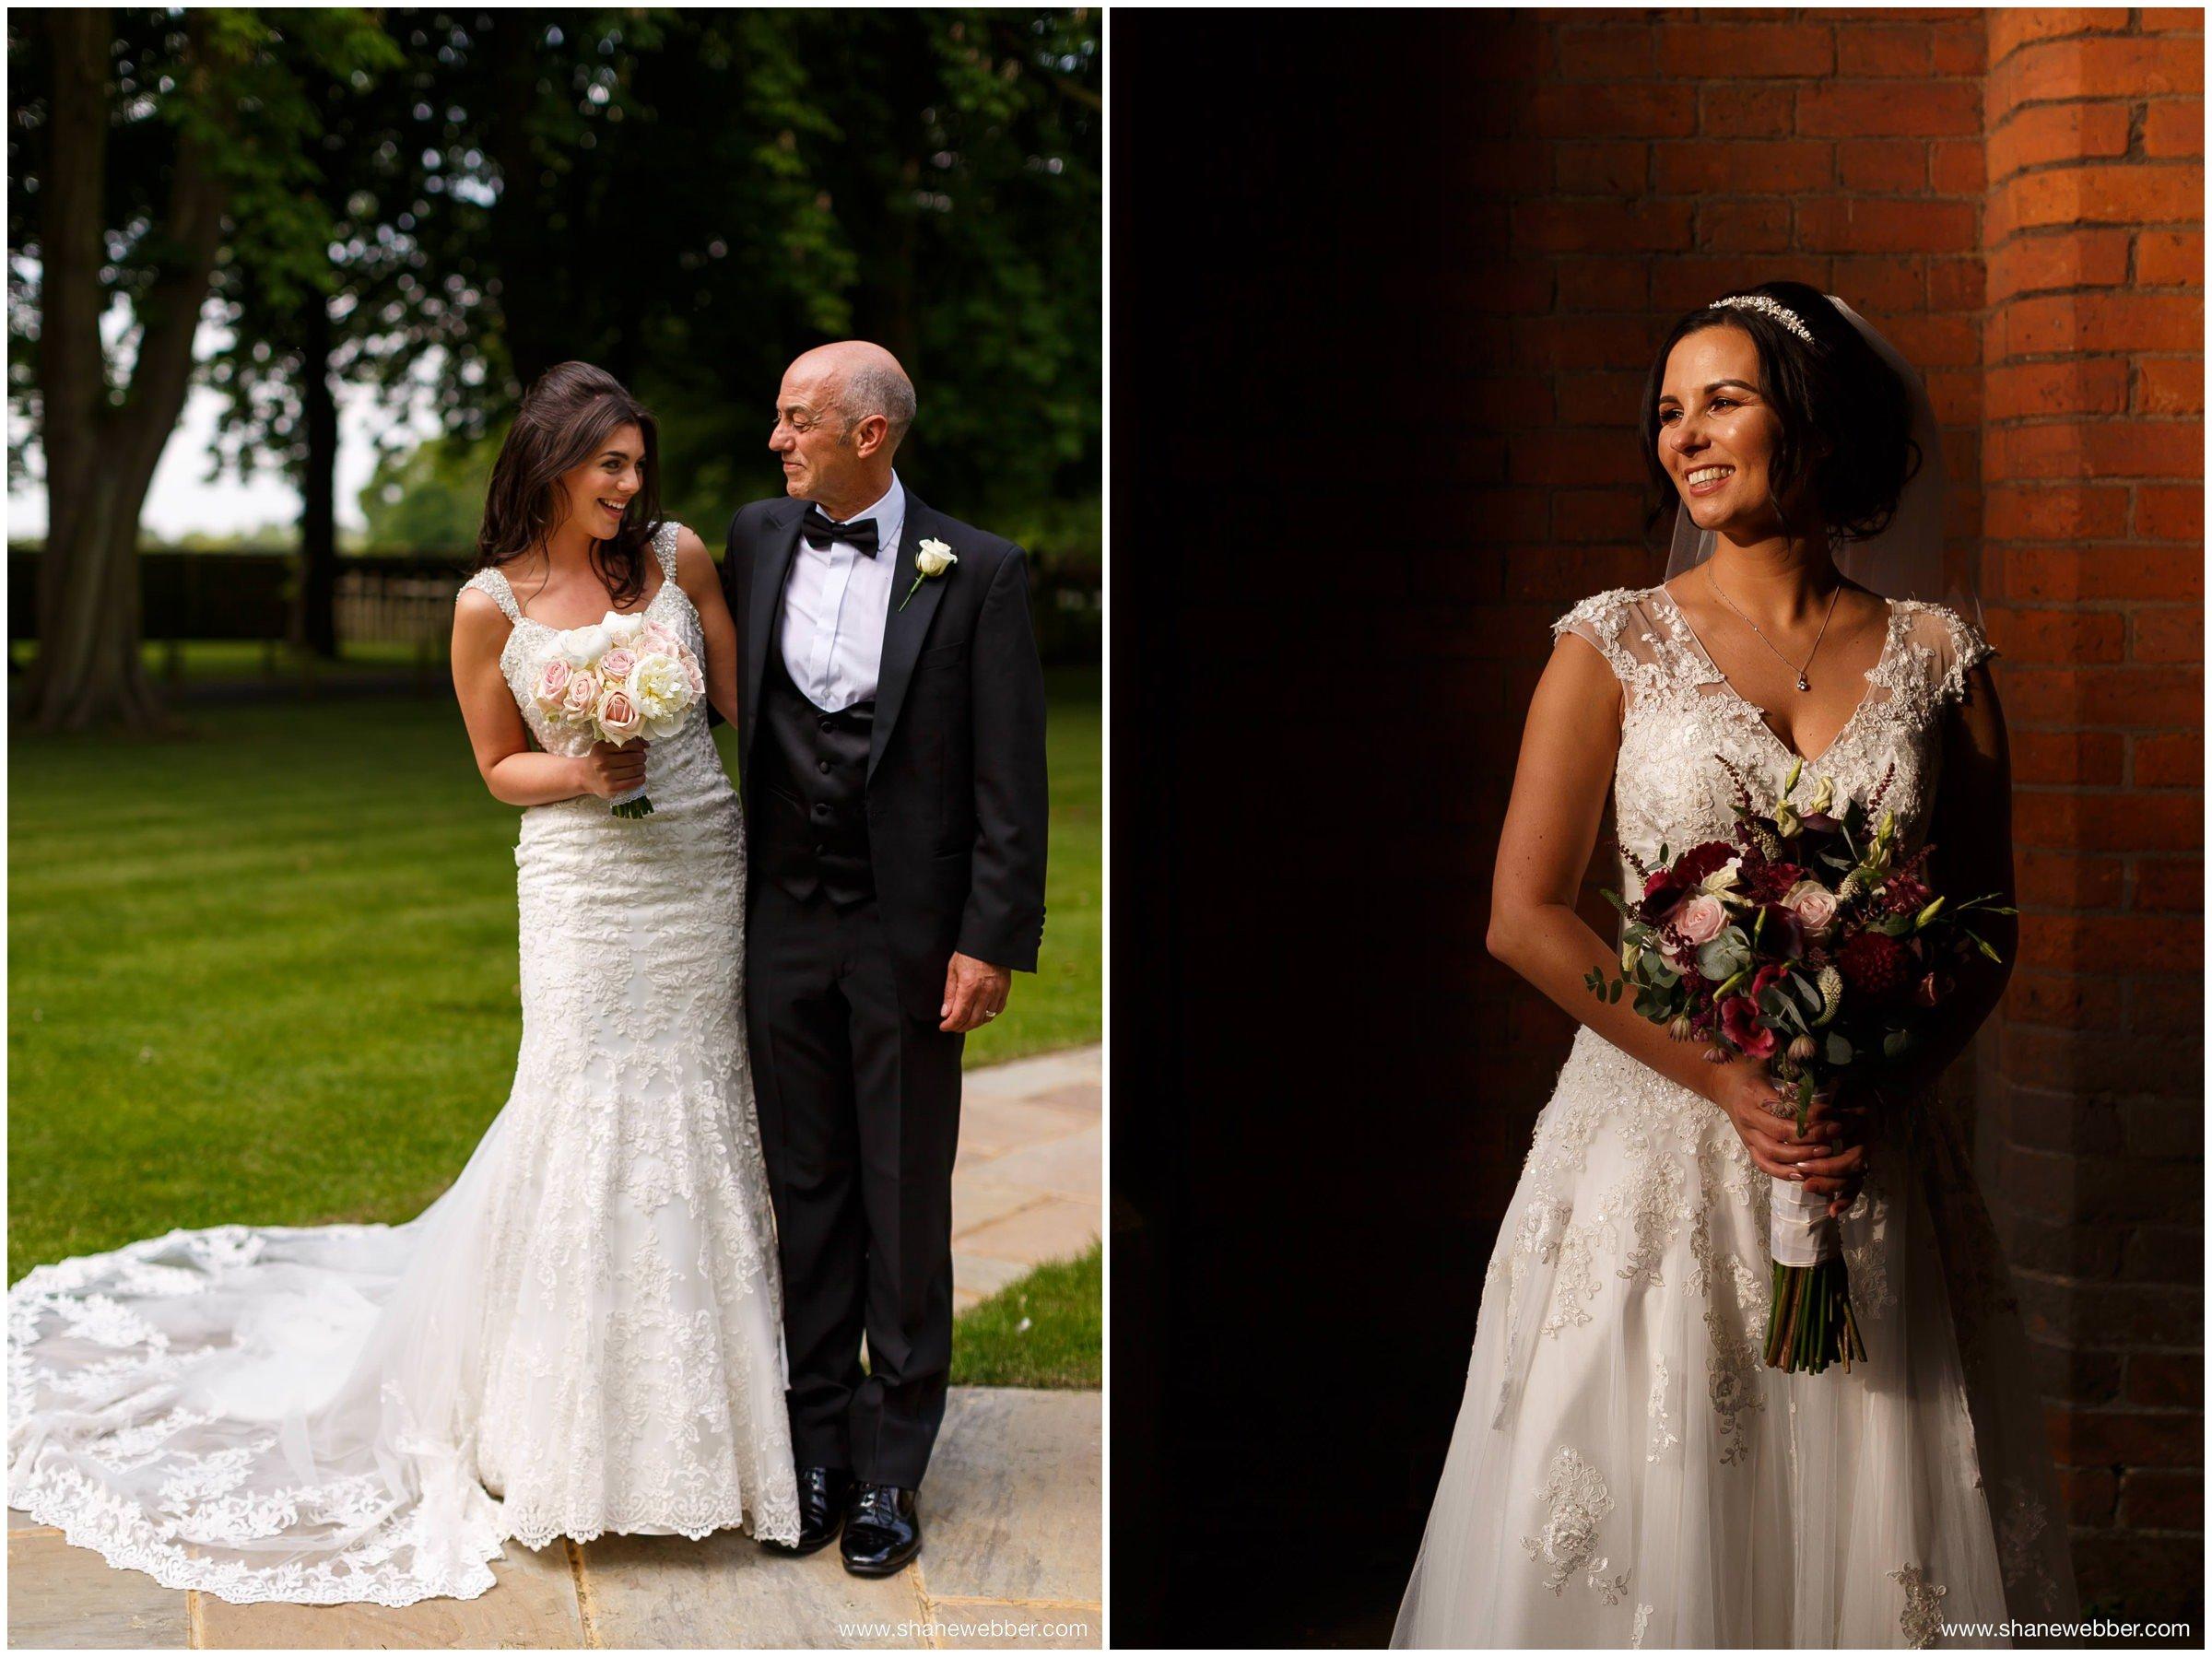 Colshaw Hall Wedding Photography 2016